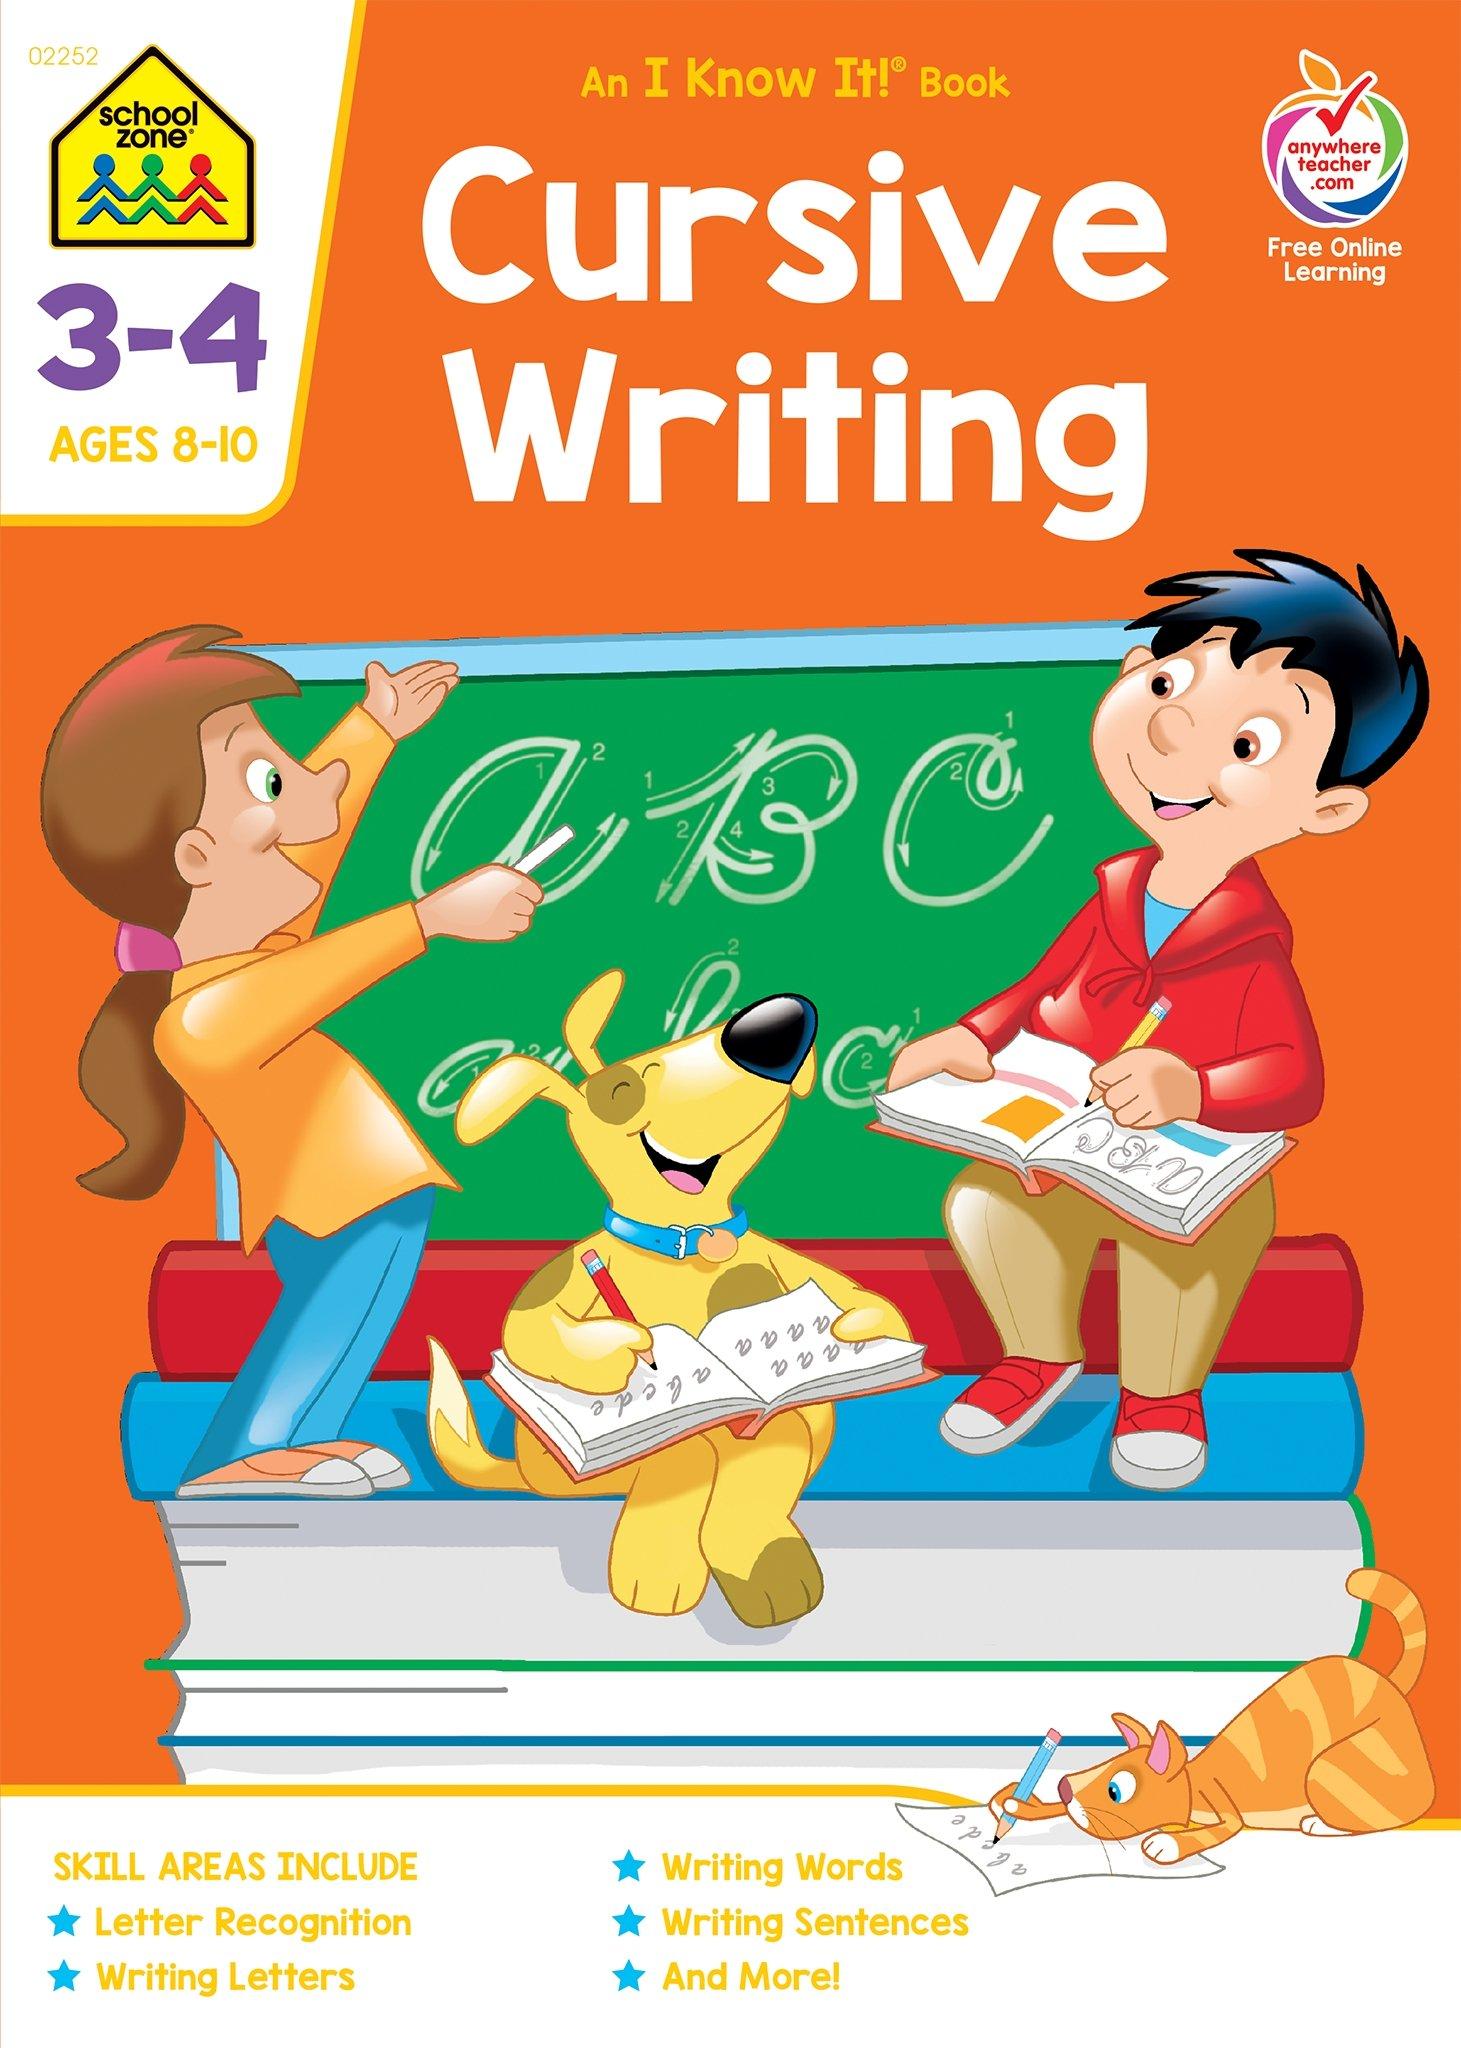 Cursive Writing Grades 3-4